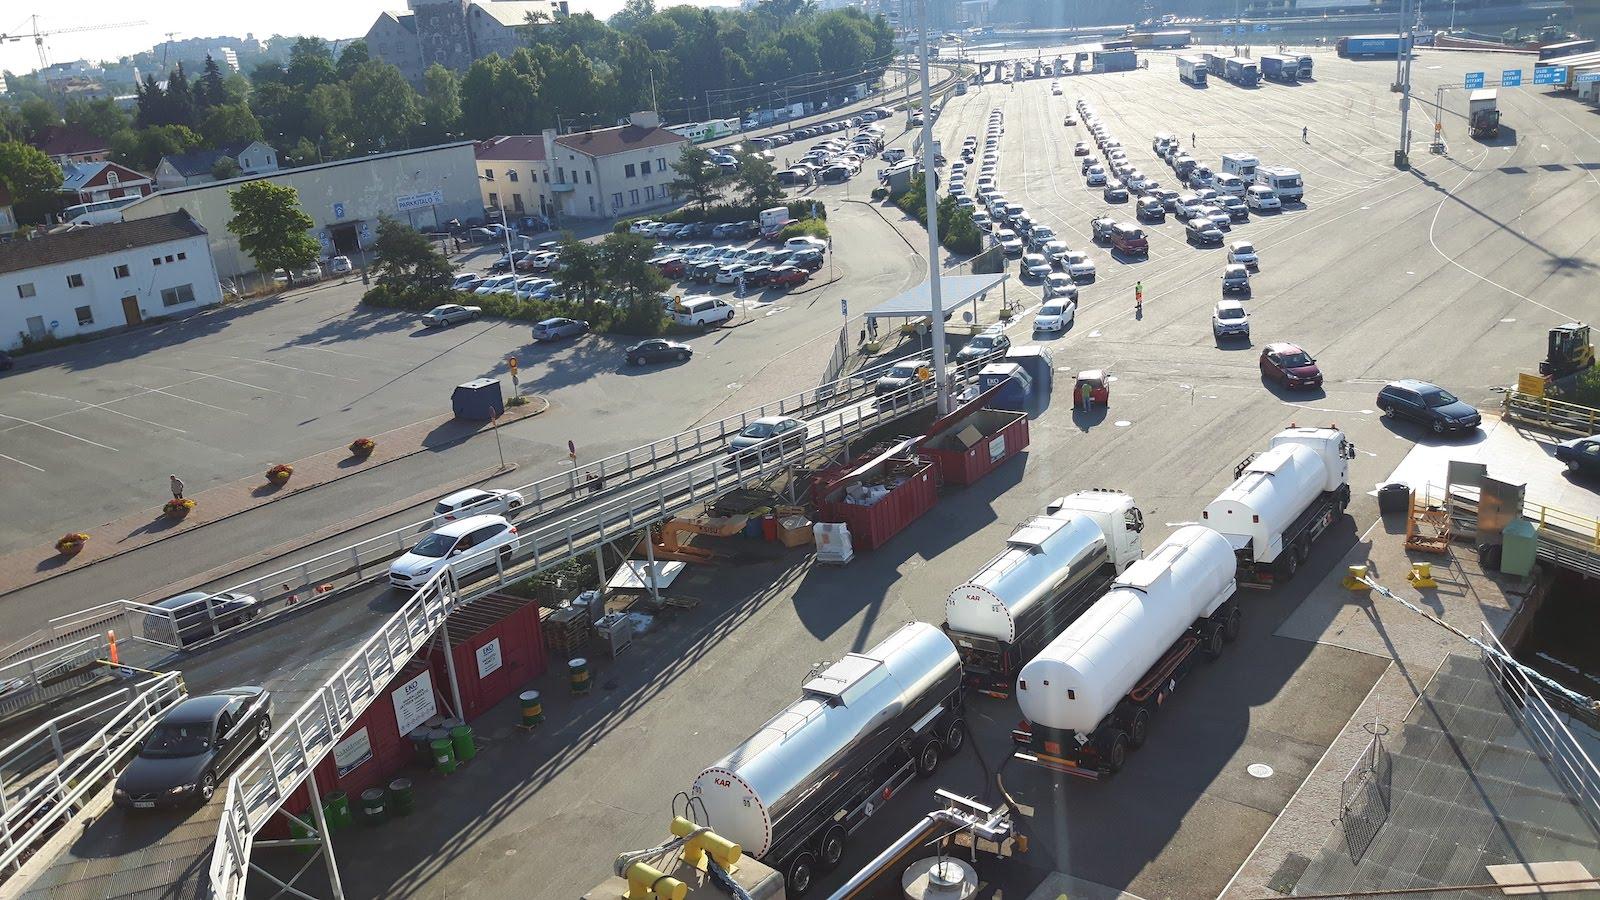 Loading the ferry in Turku Finland